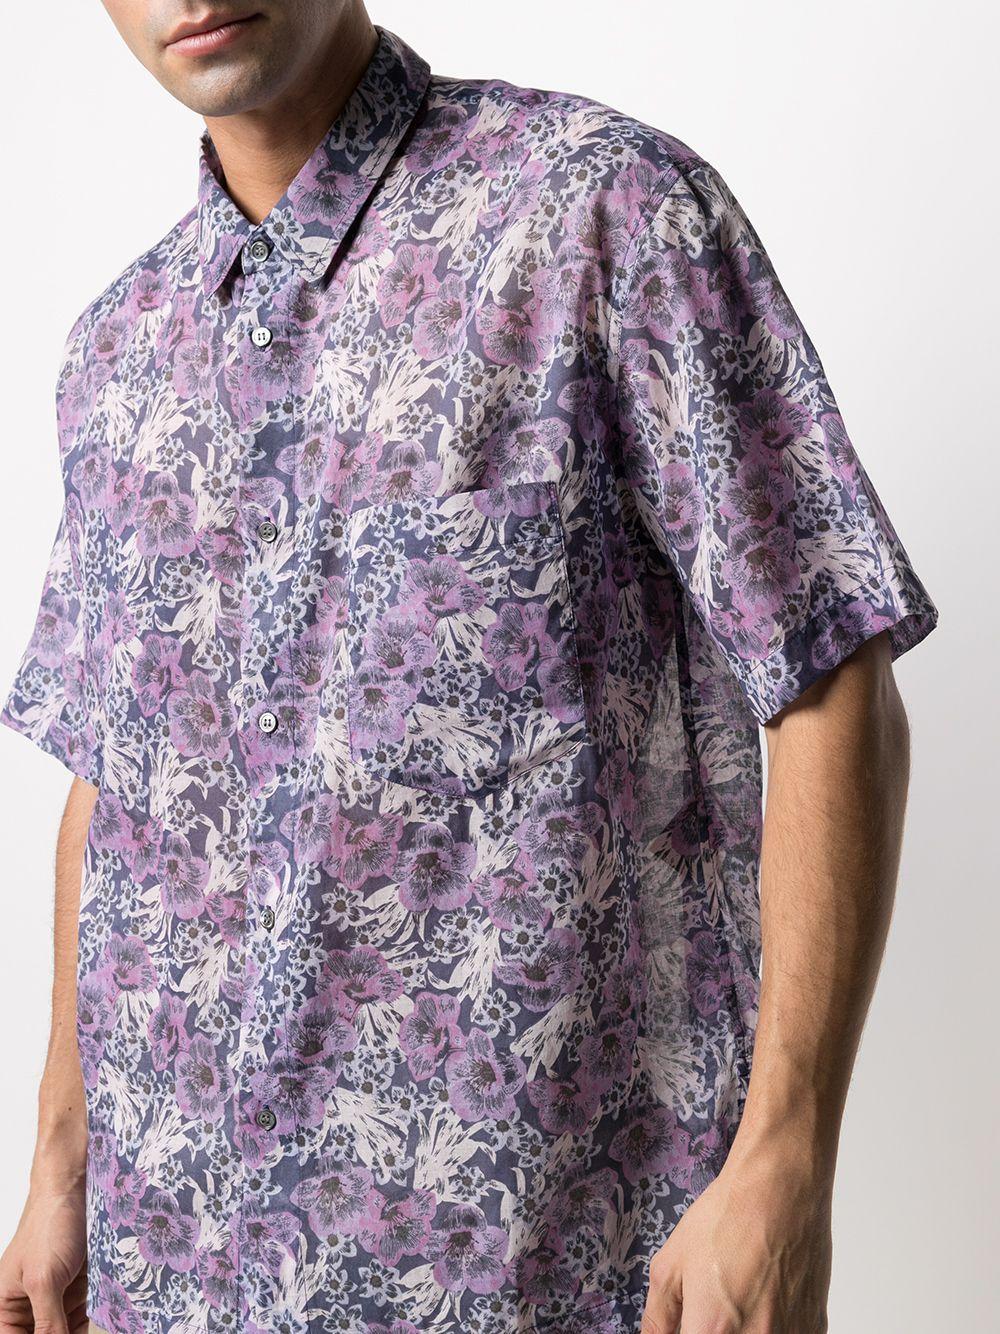 PRINT SHIRT ISABEL MARANT | Shirts | CH0734-21P009H30FN